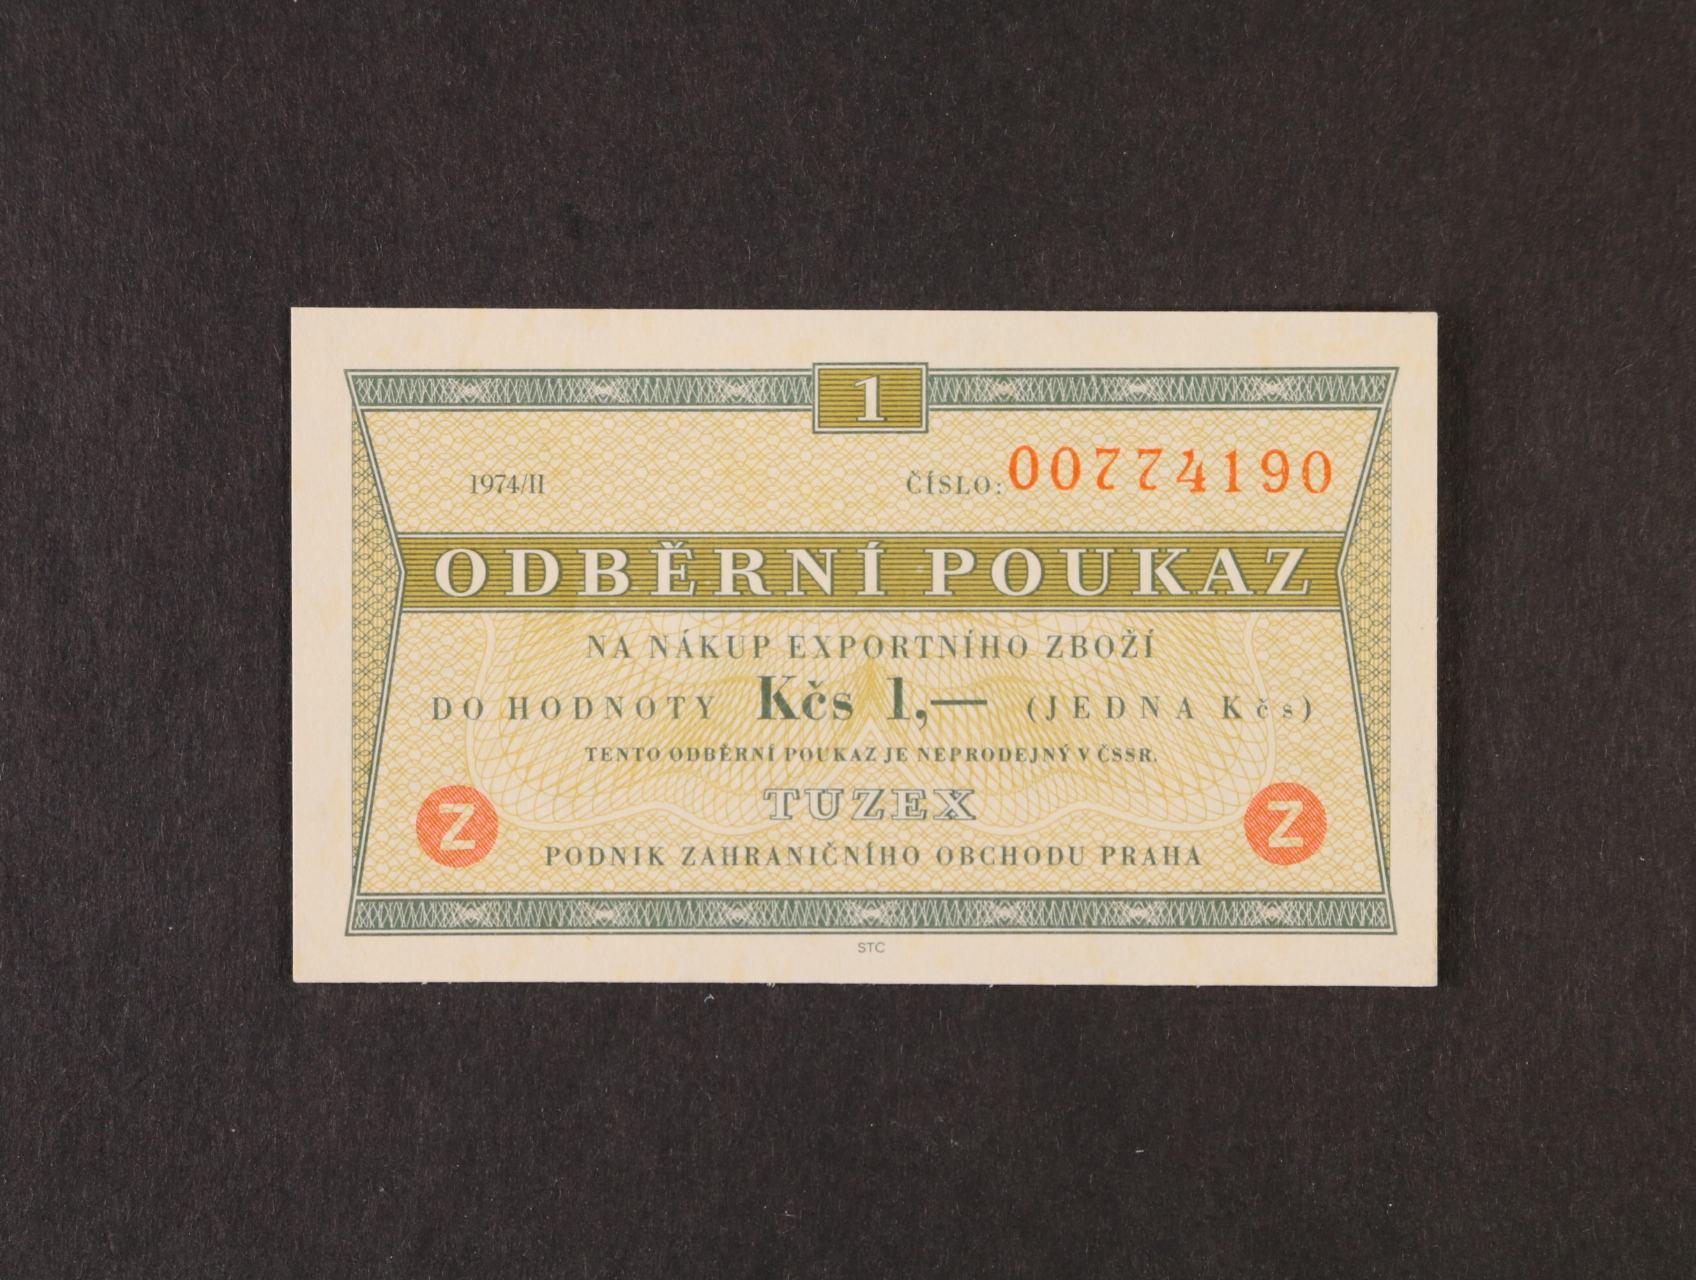 Tuzex, 1 TKčs s datem 1974/II